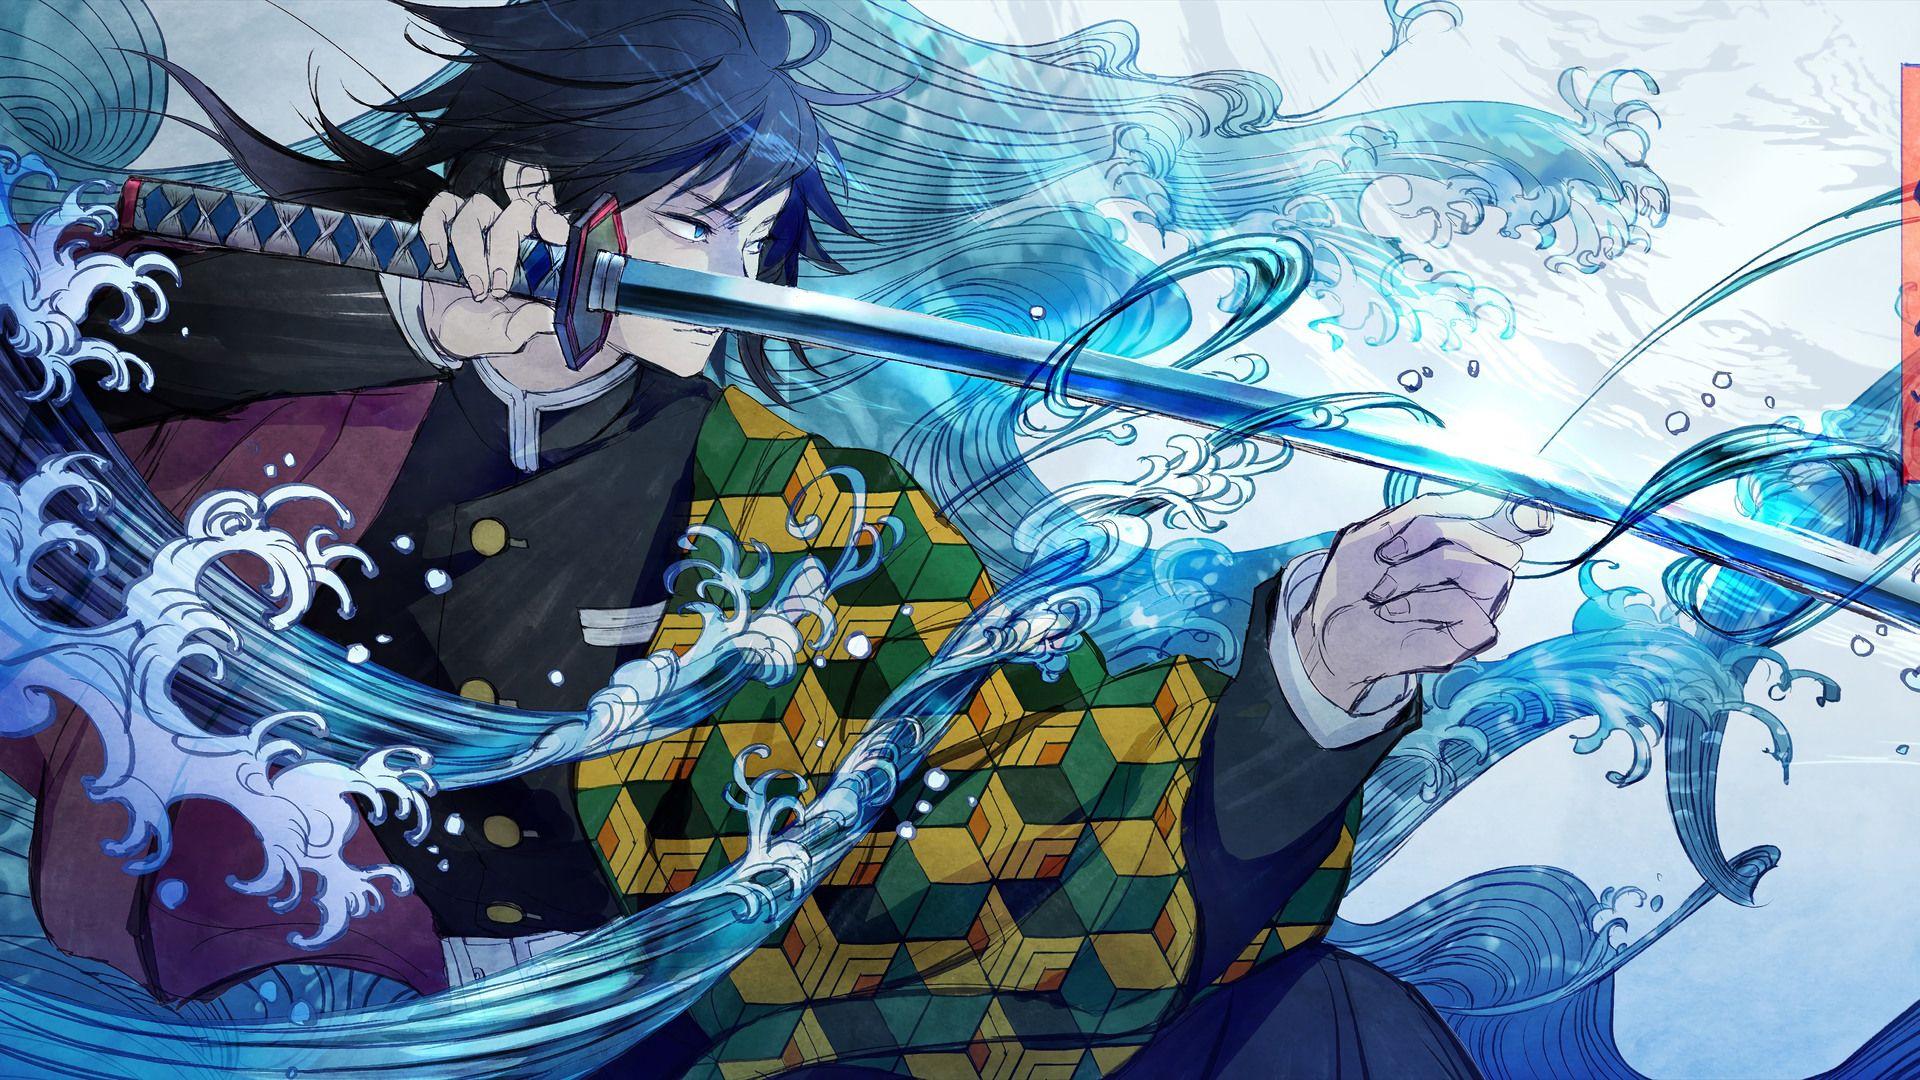 Giyu Tomioka Wallpaper Di 2020 Seni Anime Gambar Karakter Kertas Dinding